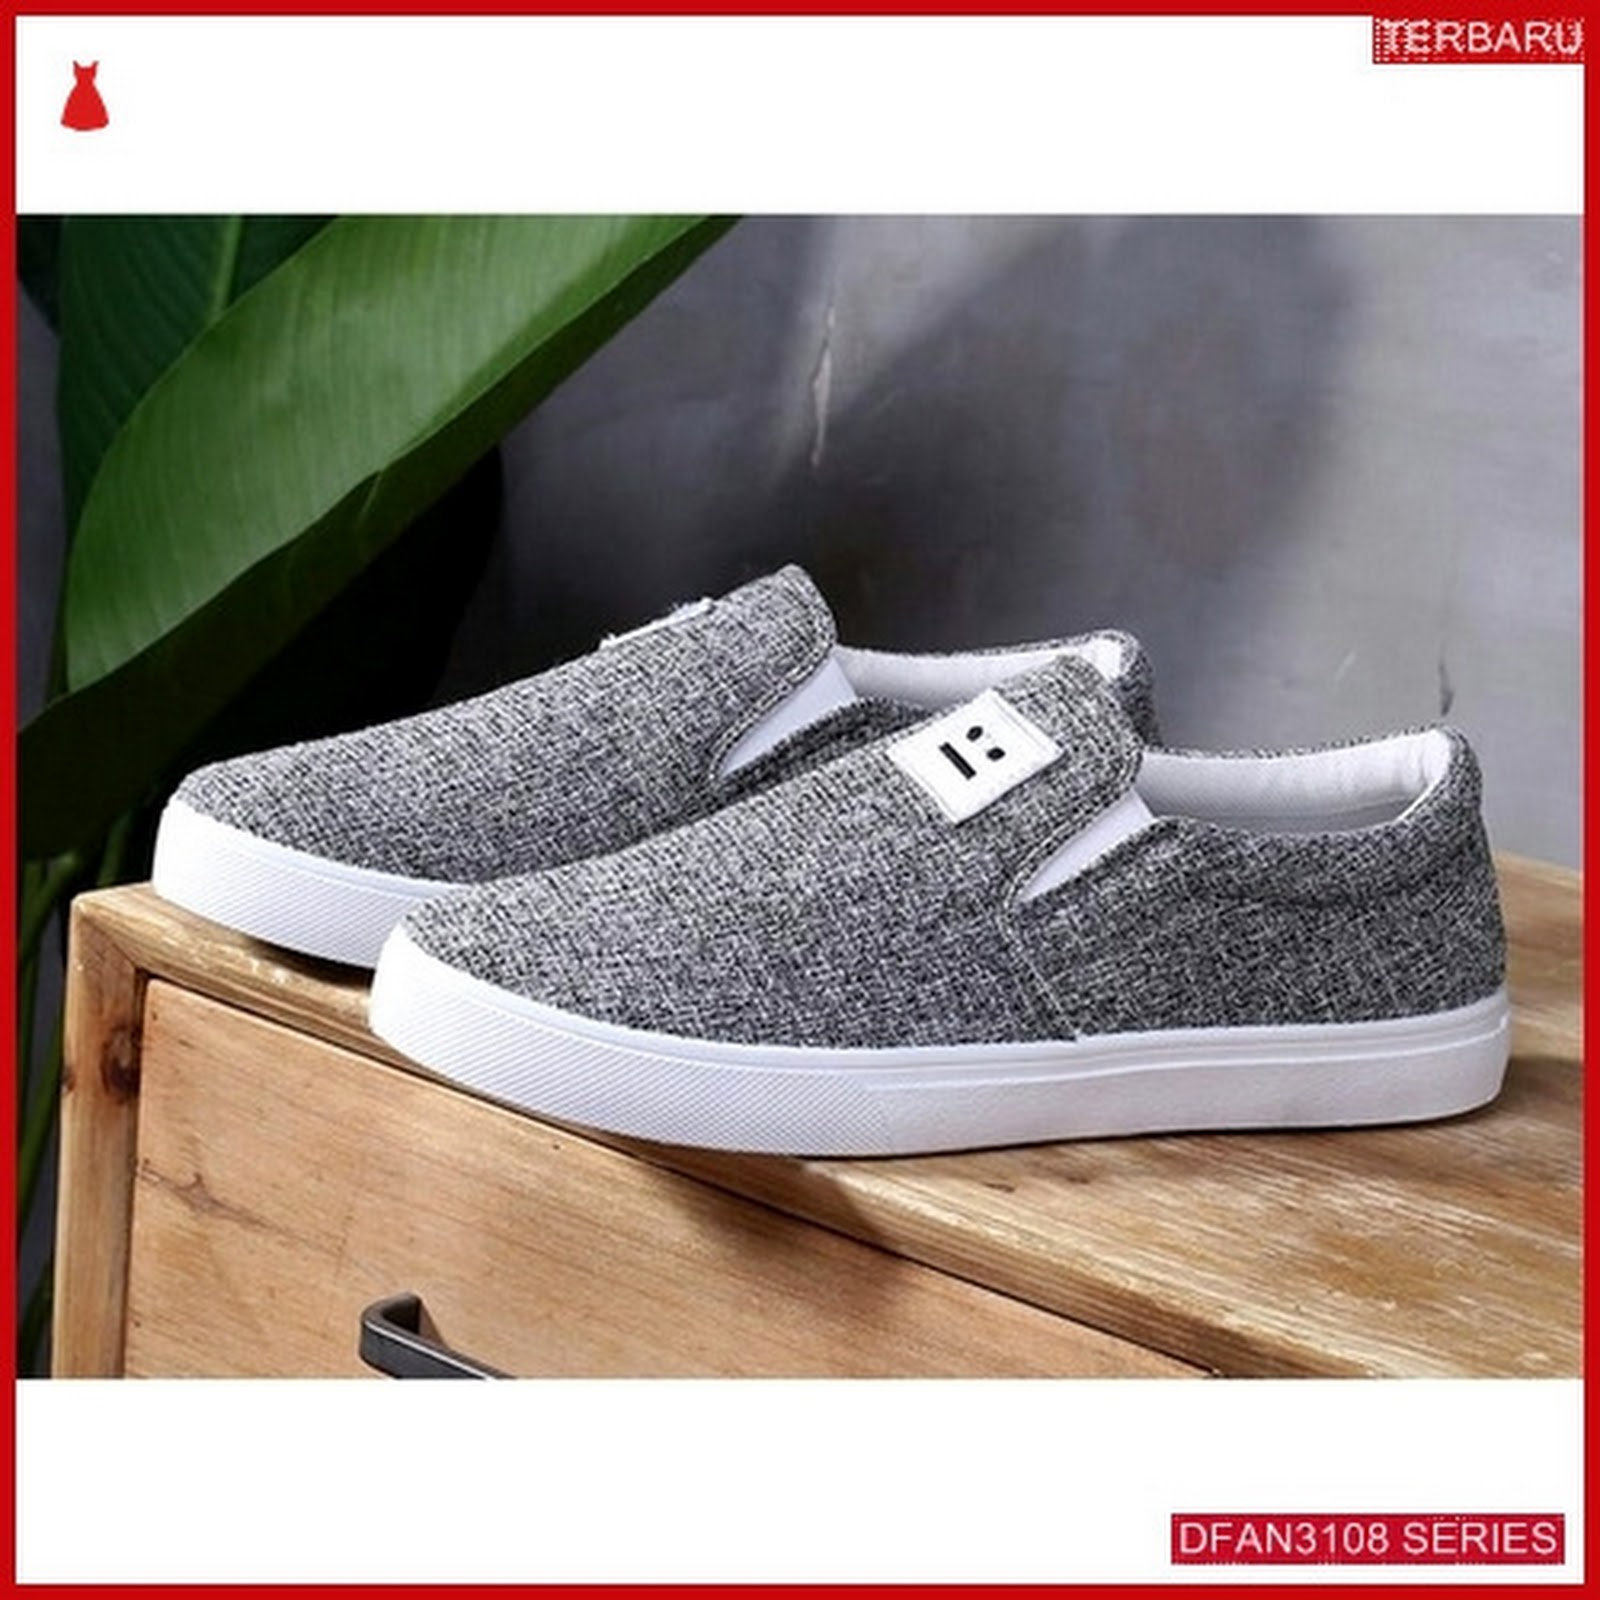 Jual Sepatu Sneacker Ys 6 Murah - Daftar Harga   Barang Terbaru dan ... 9ad9a3107b